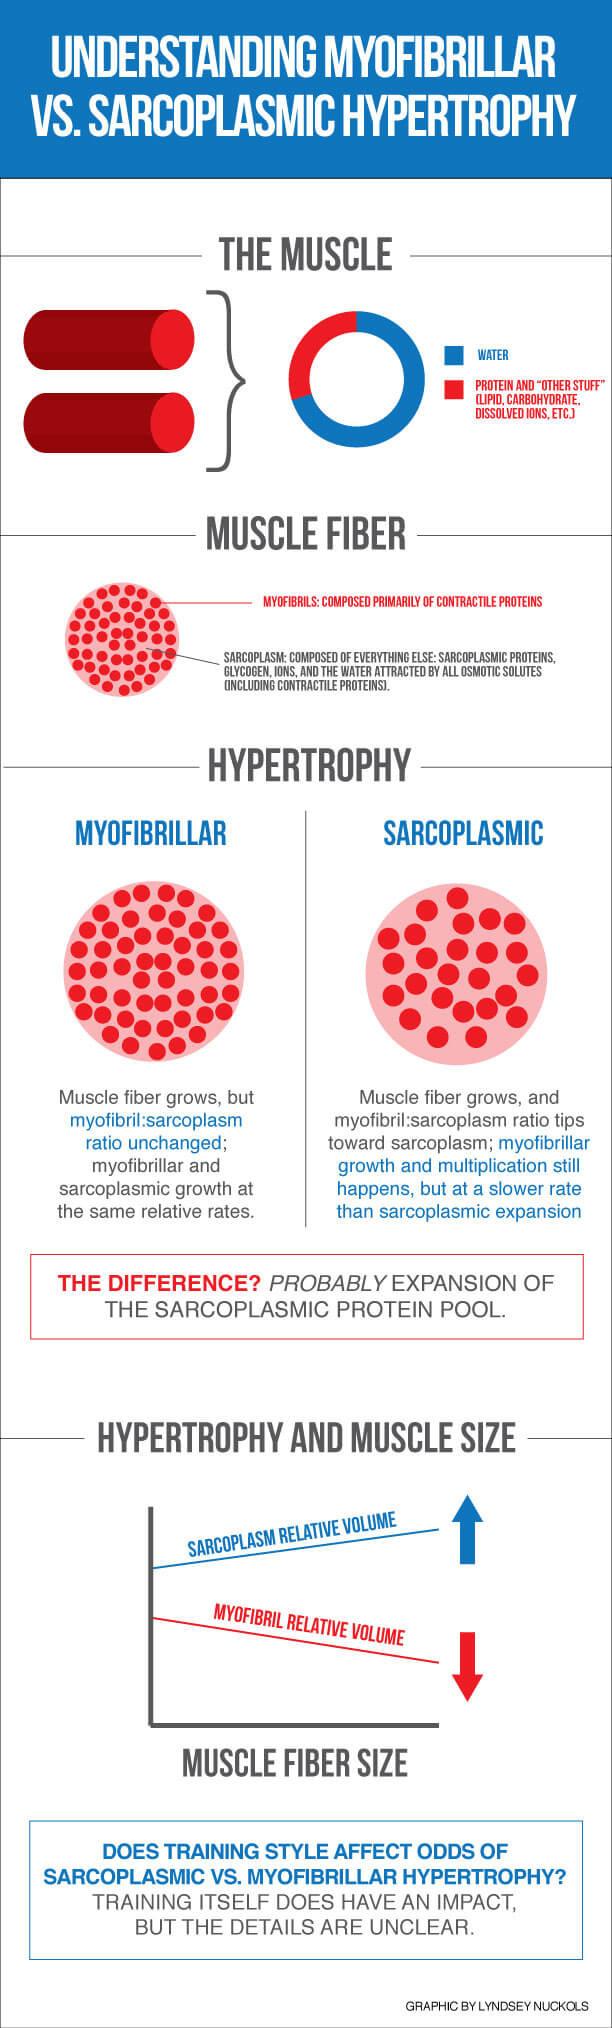 Sarcoplasmic hypertrophy vs myofibrillar hypertrophy infographic